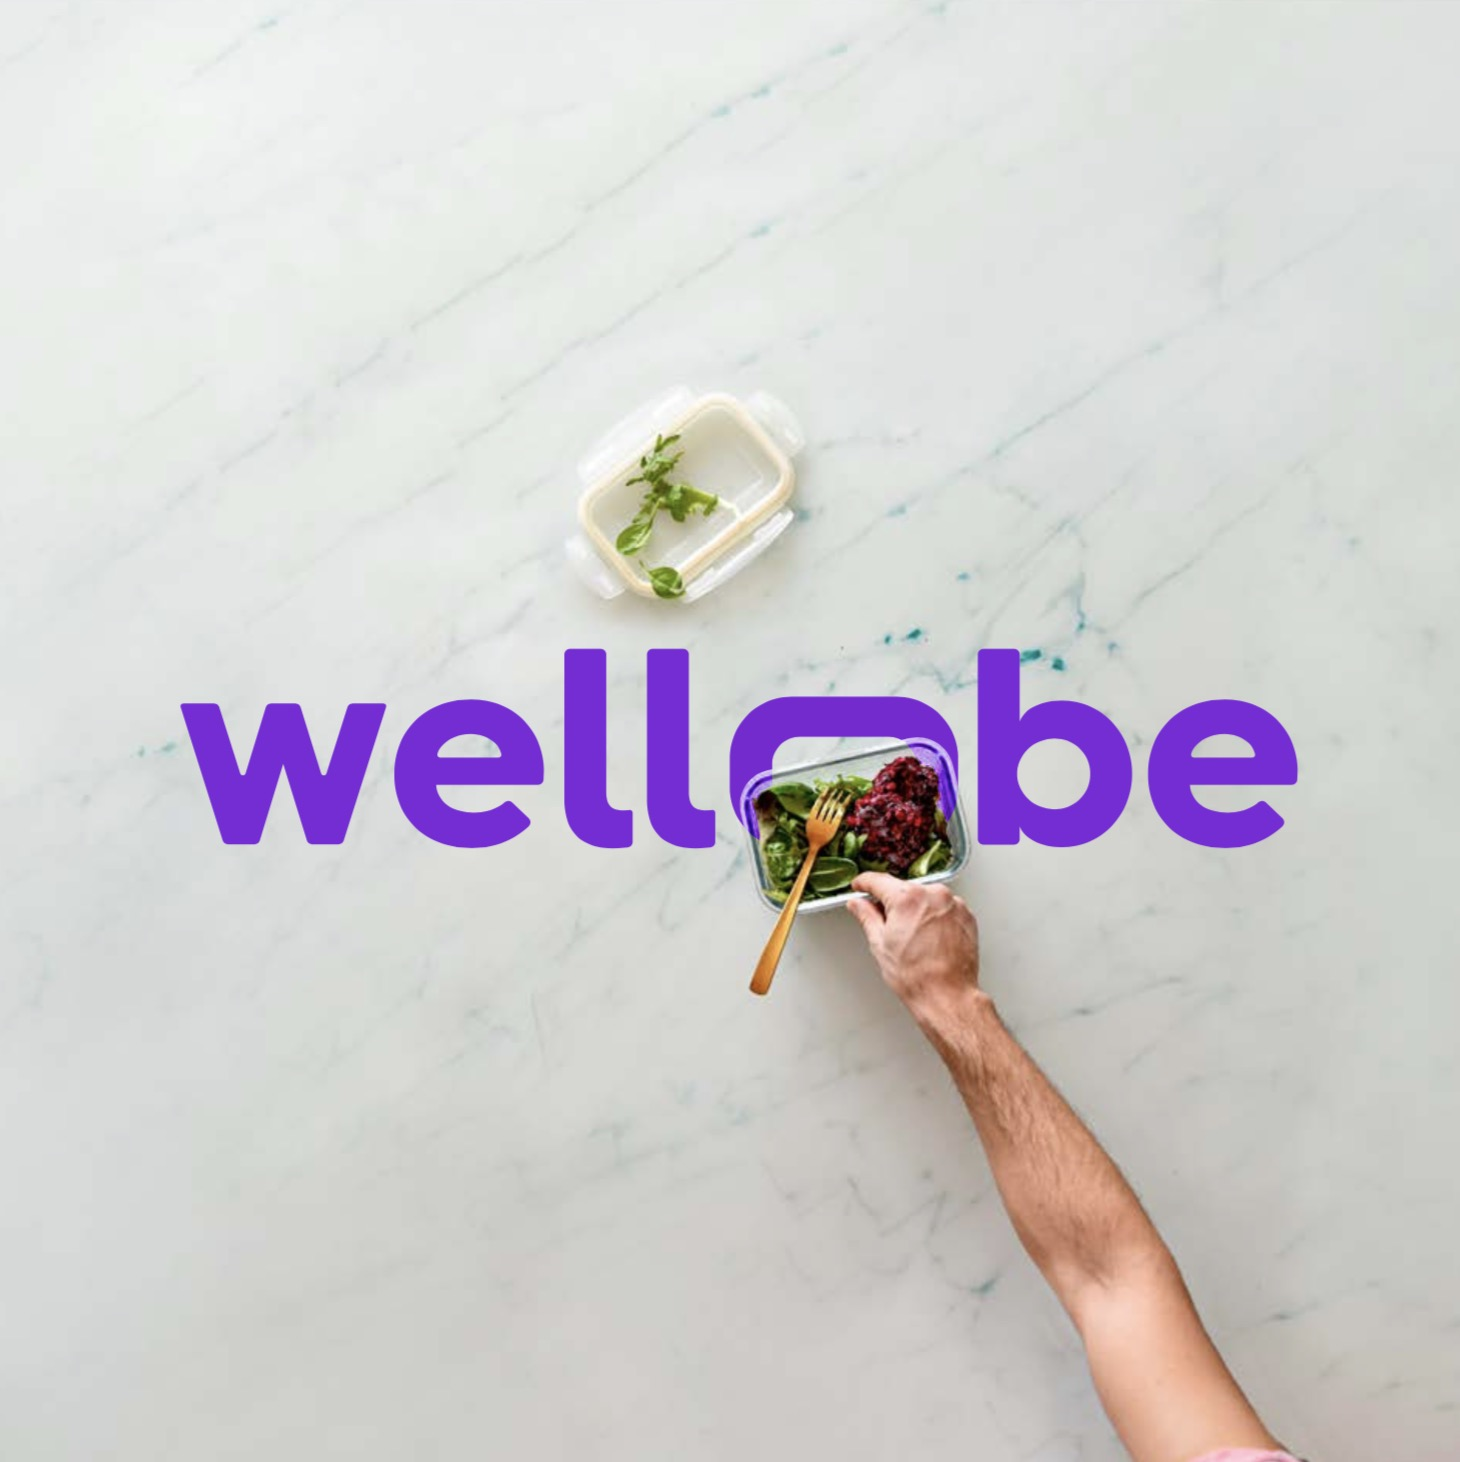 Wellobe